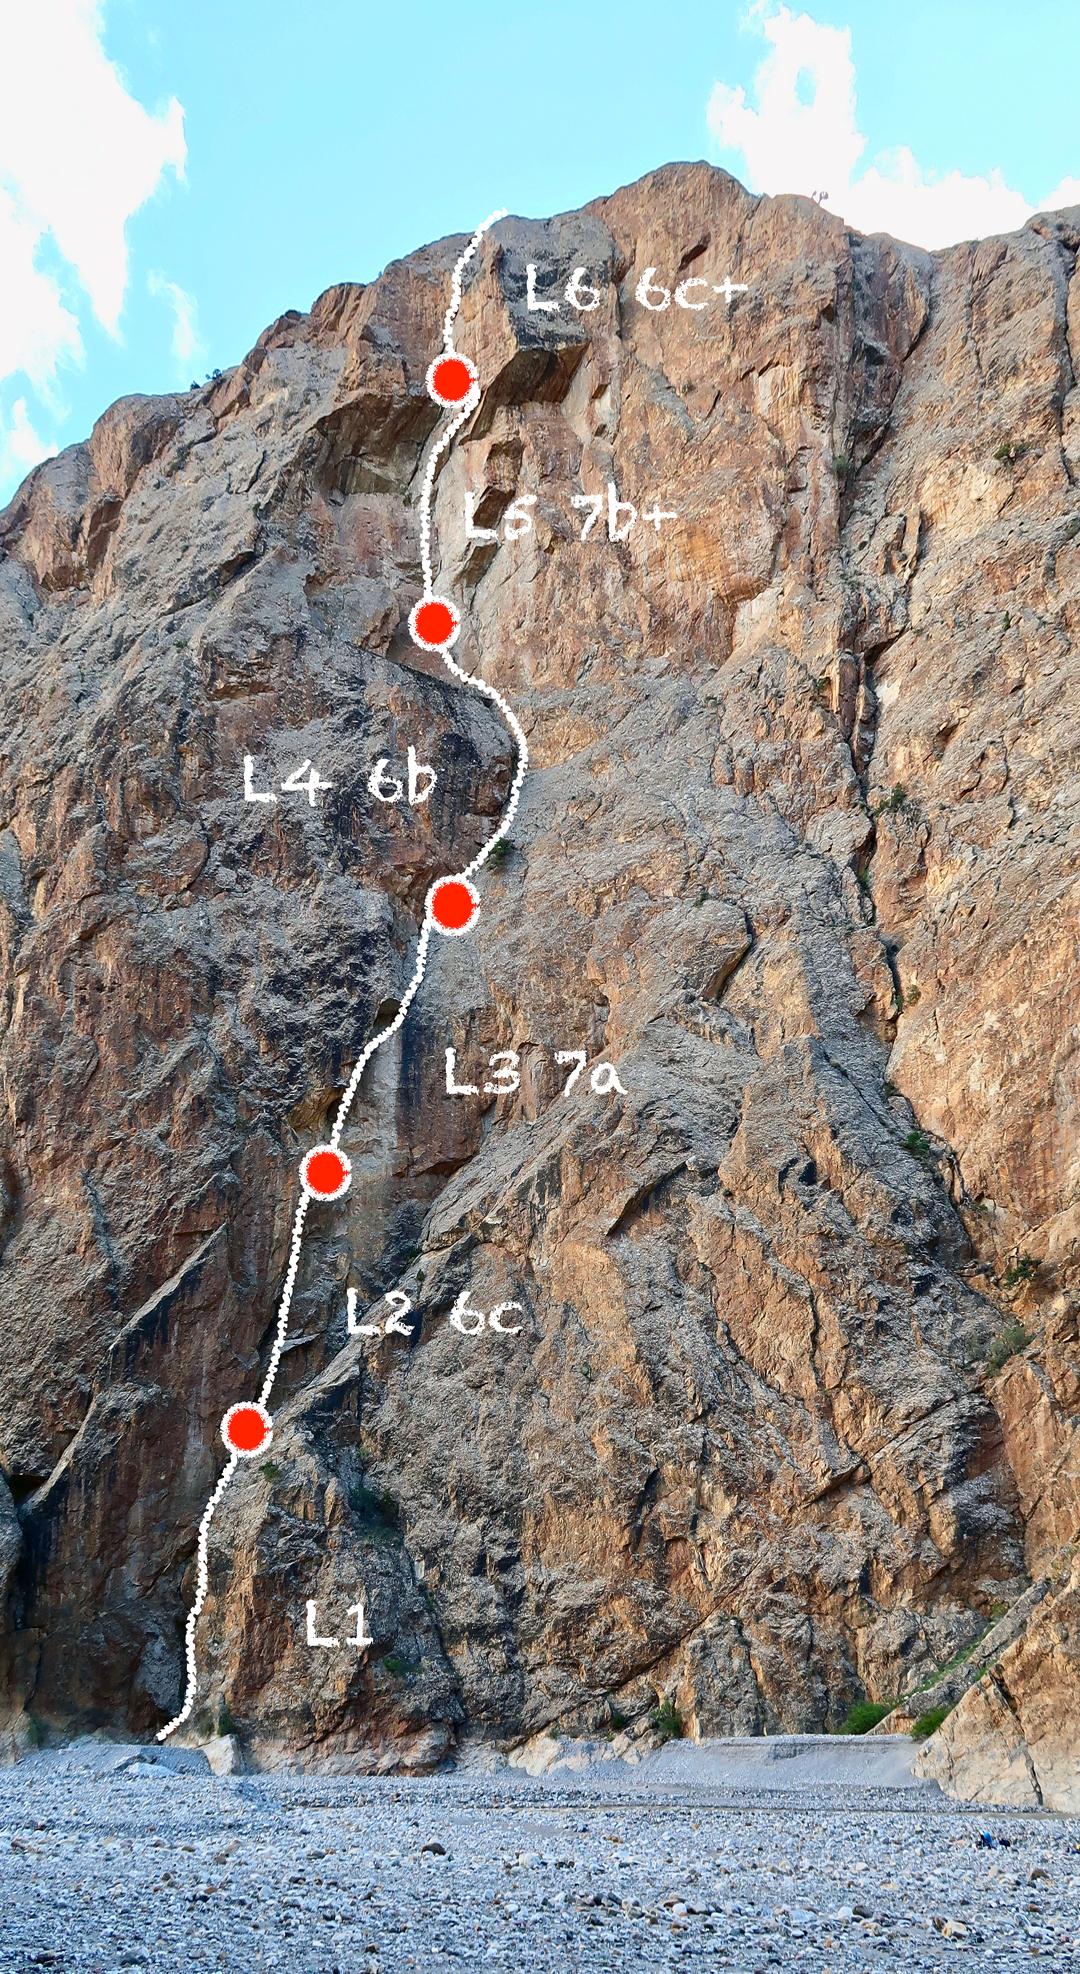 Removable Crux (250m, 7b+), Yarkhun Valley.